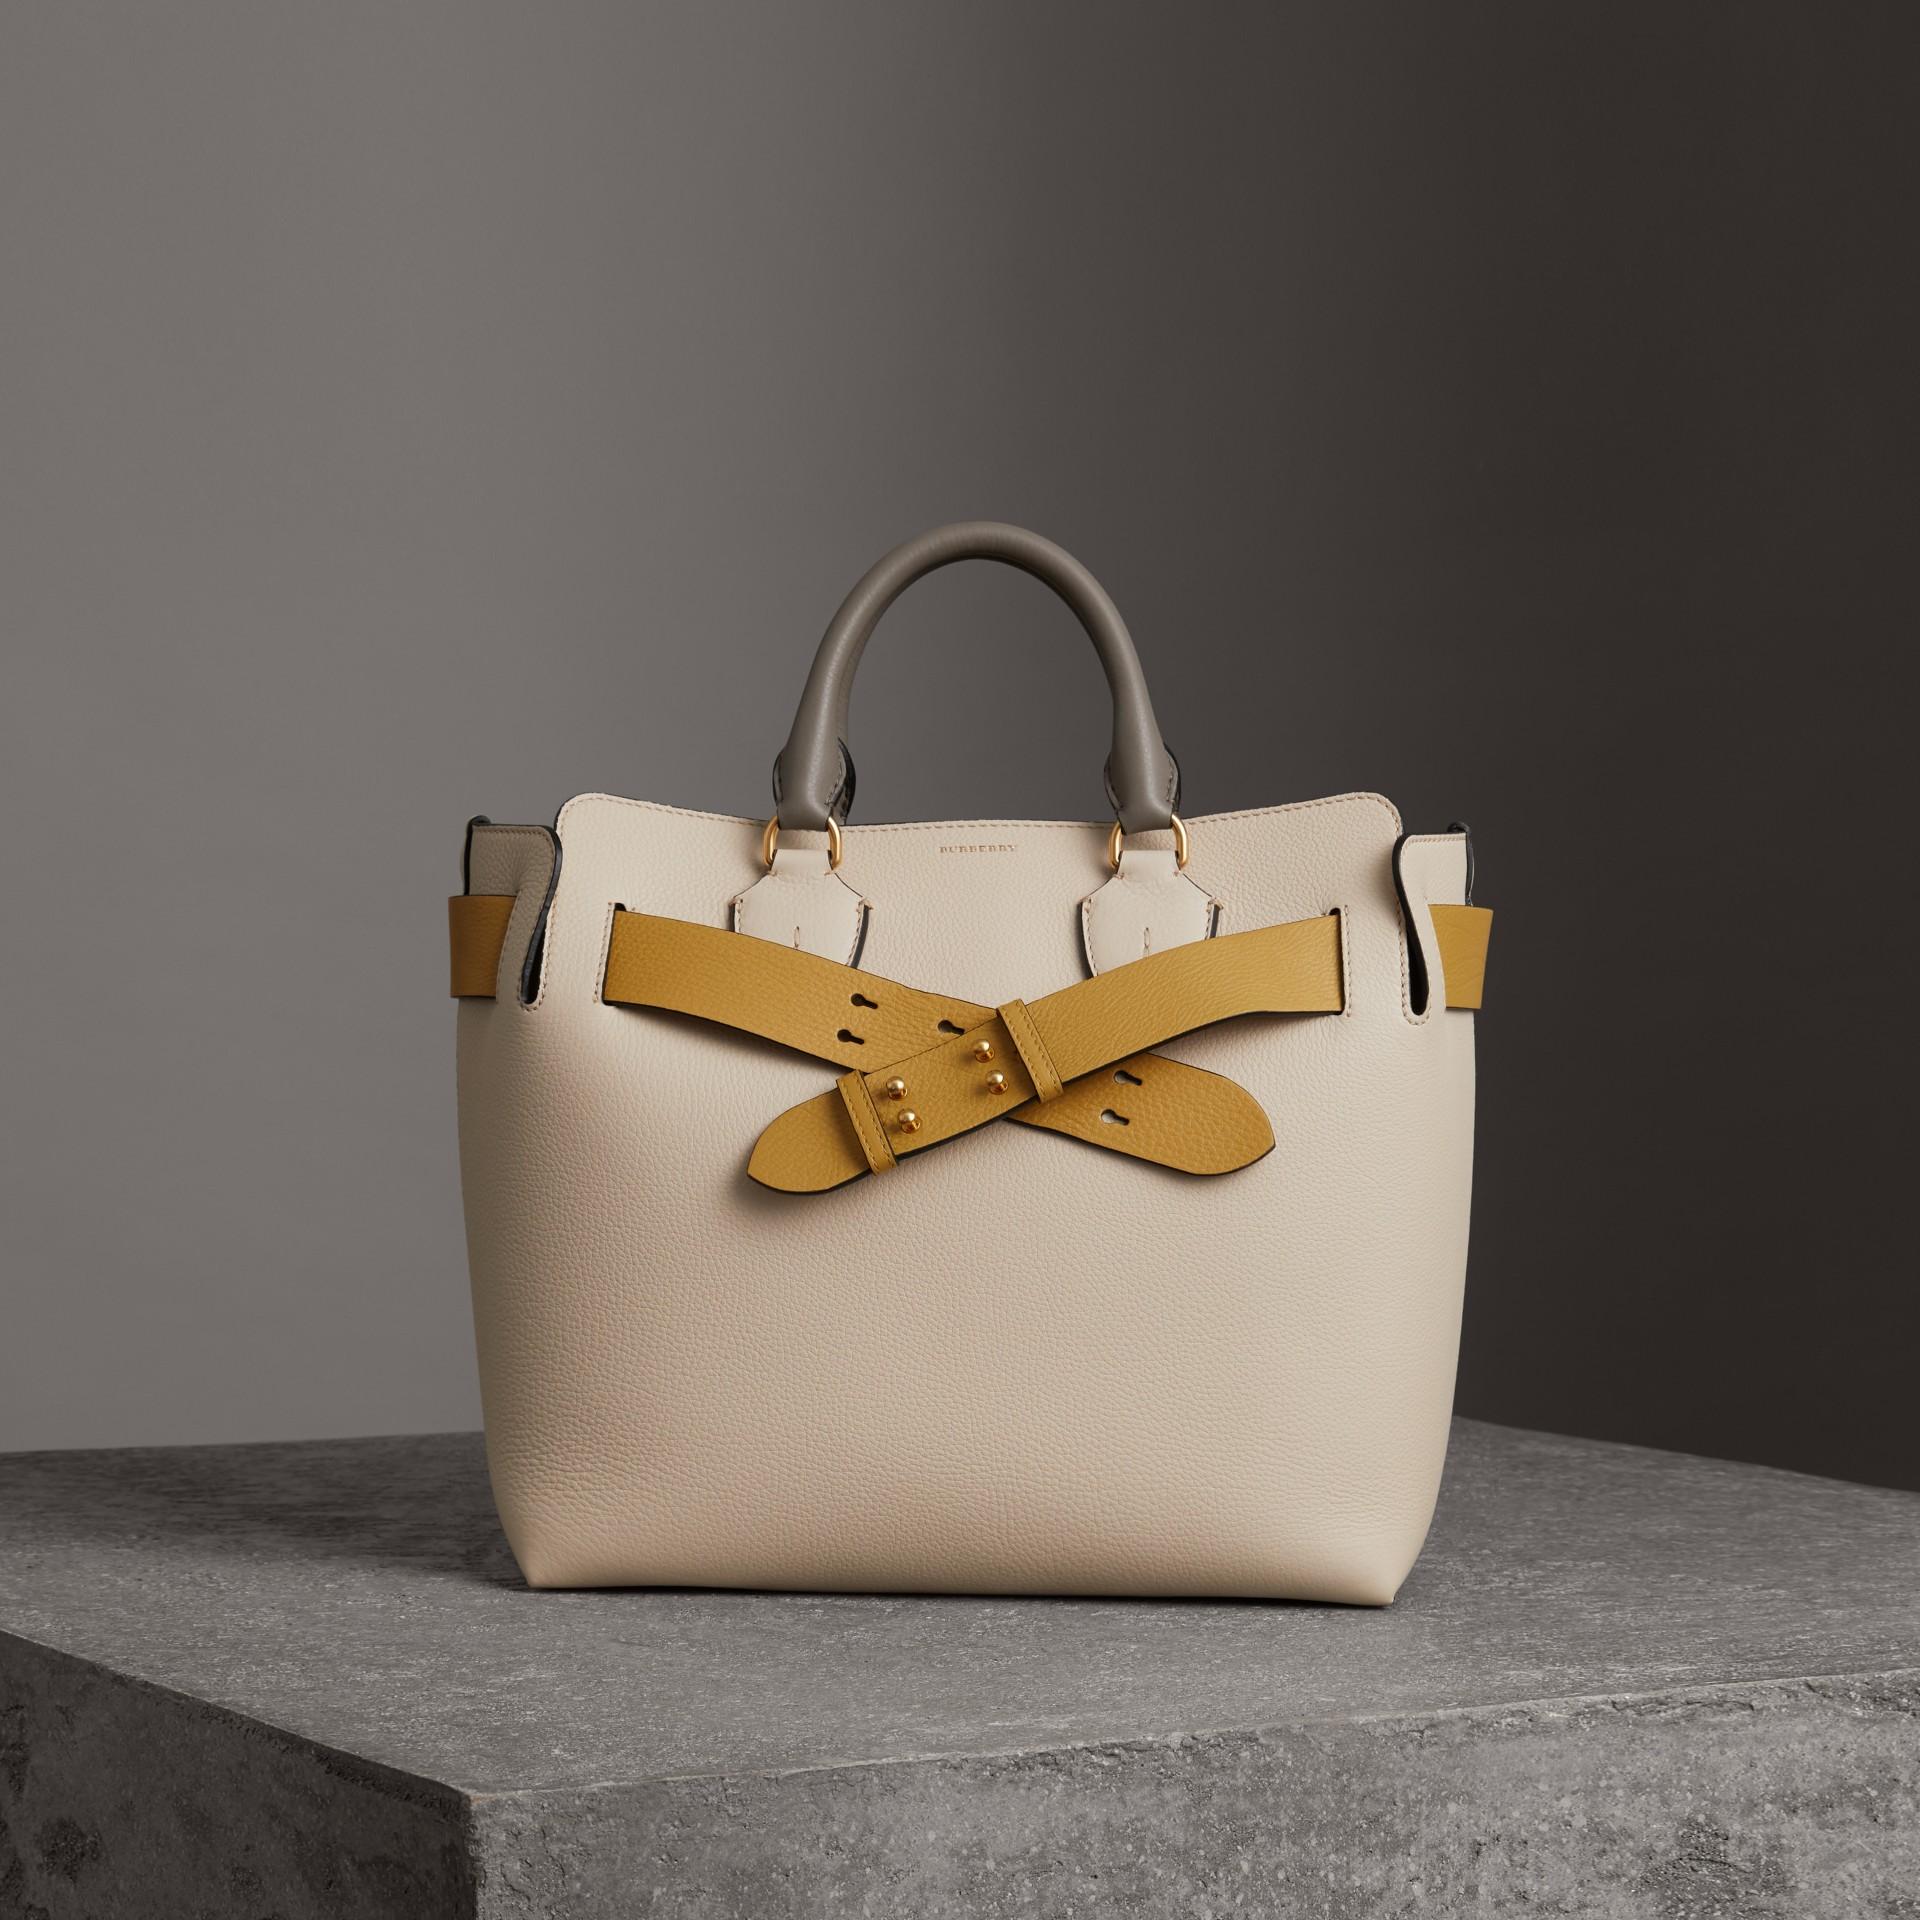 Burberry The Medium Tri-Tone Leather Belt Bag In Limestone Crnflr ... 1905b51024